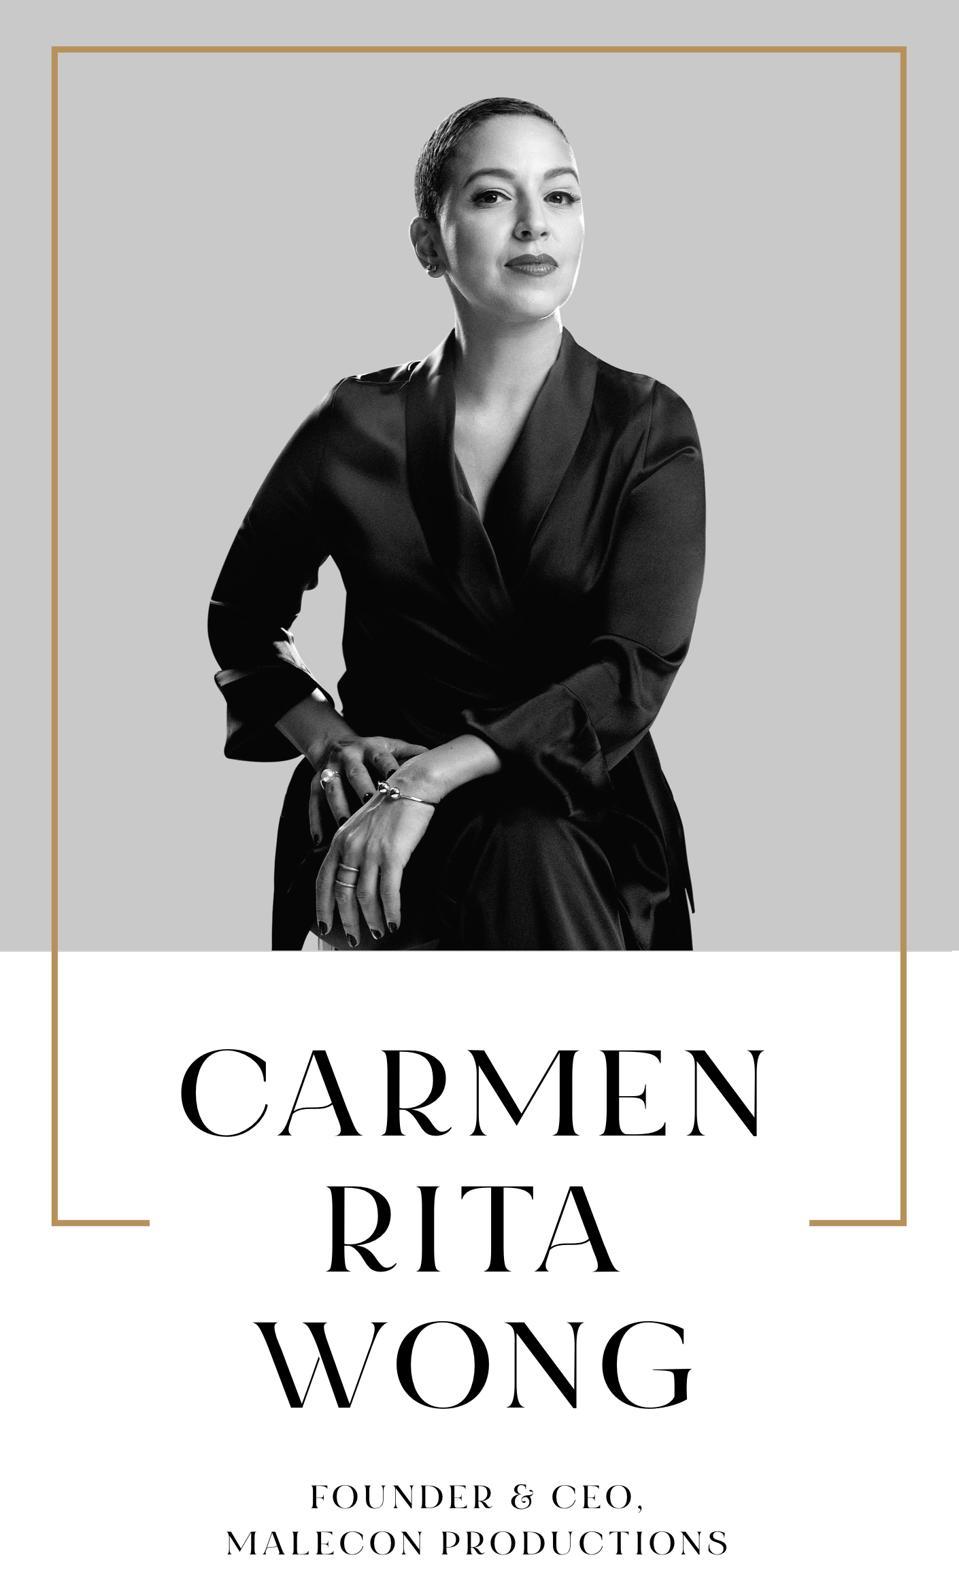 Carmen Rita Wong Founder & CEO, Malecon Productions